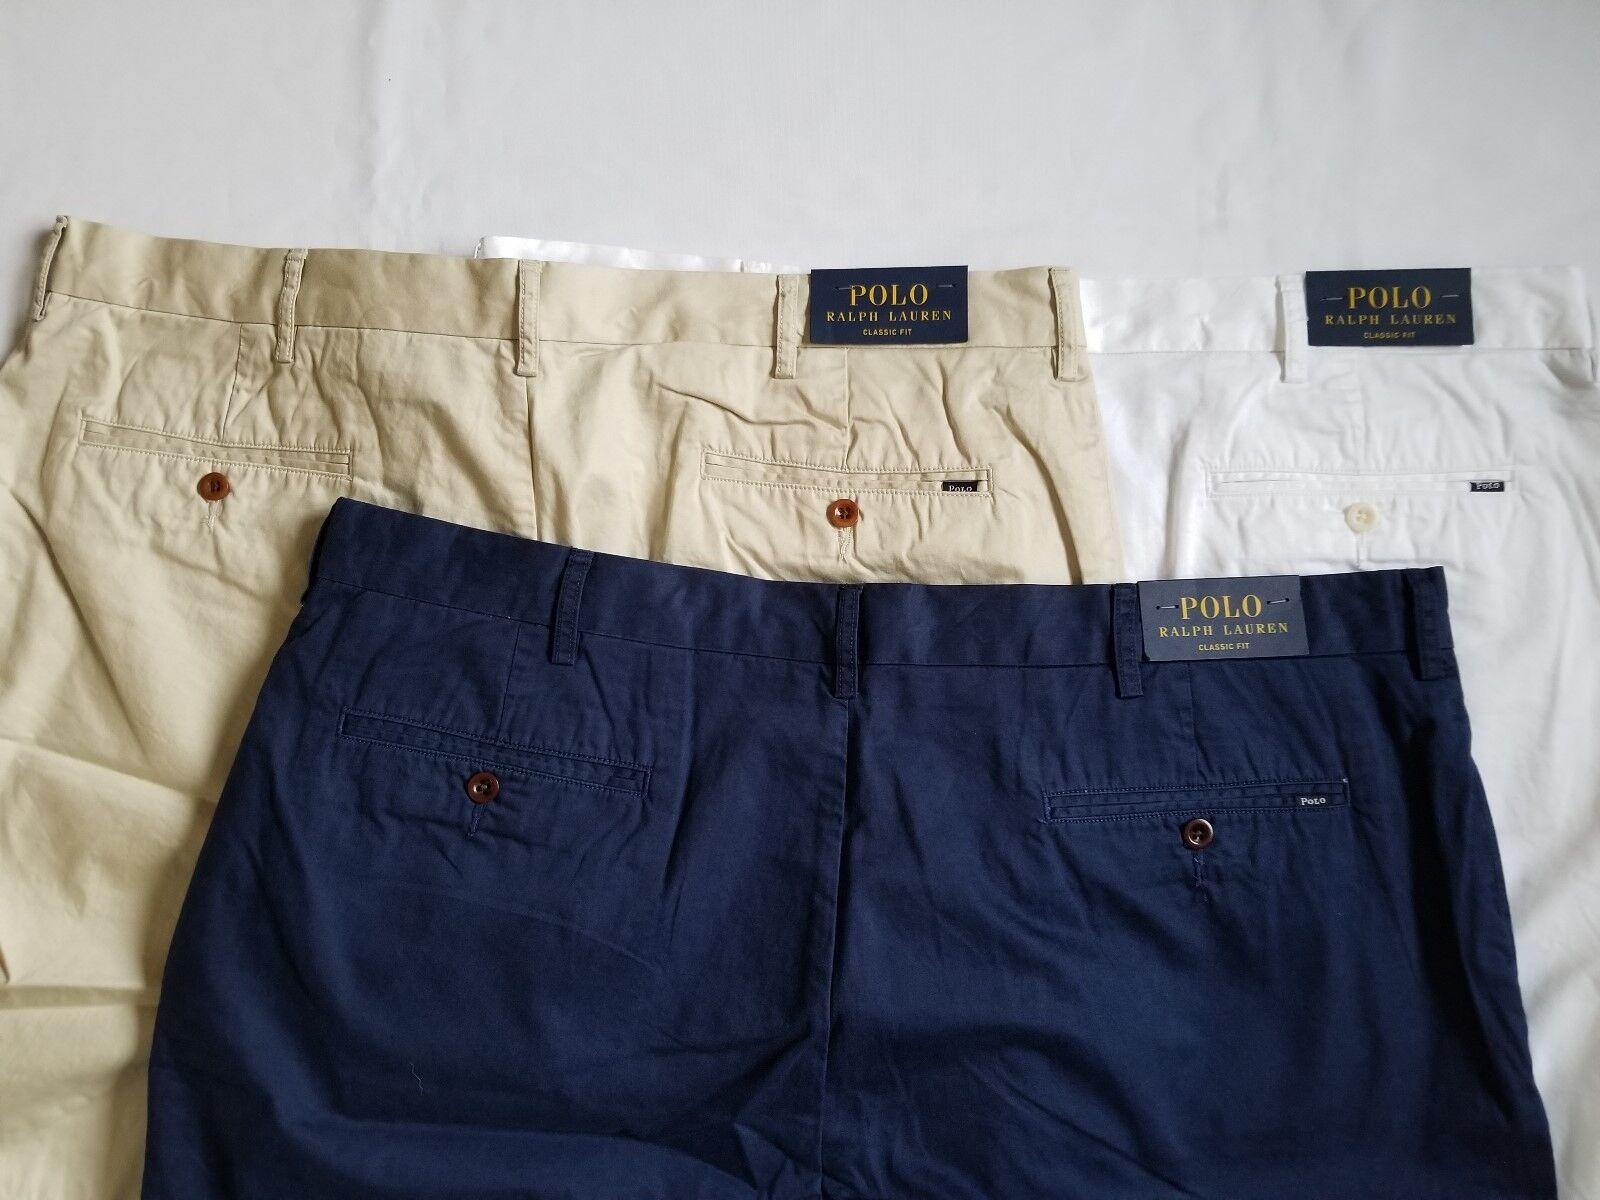 Polo Ralph Lauren Men's Classic Fit Lightweight Cotton Shorts Pants Great Gift